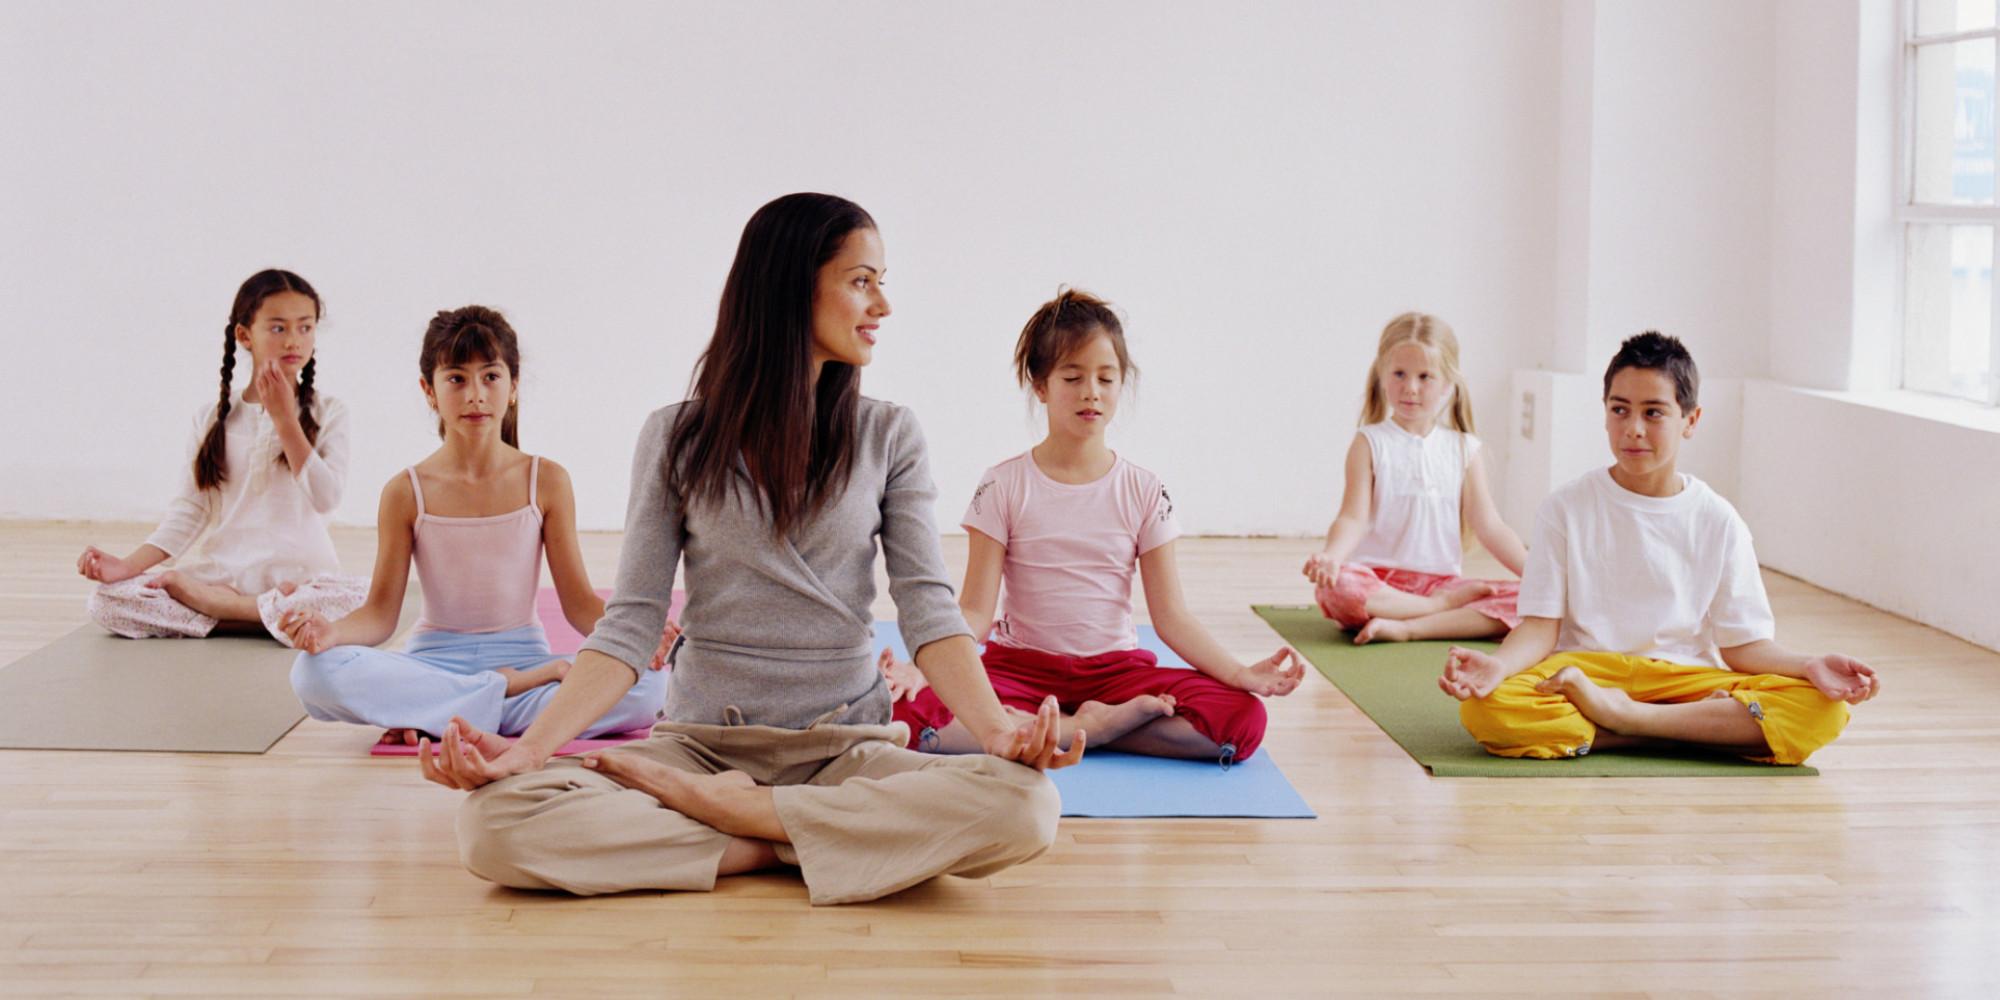 Woman Teaching Children 7 10 Yoga